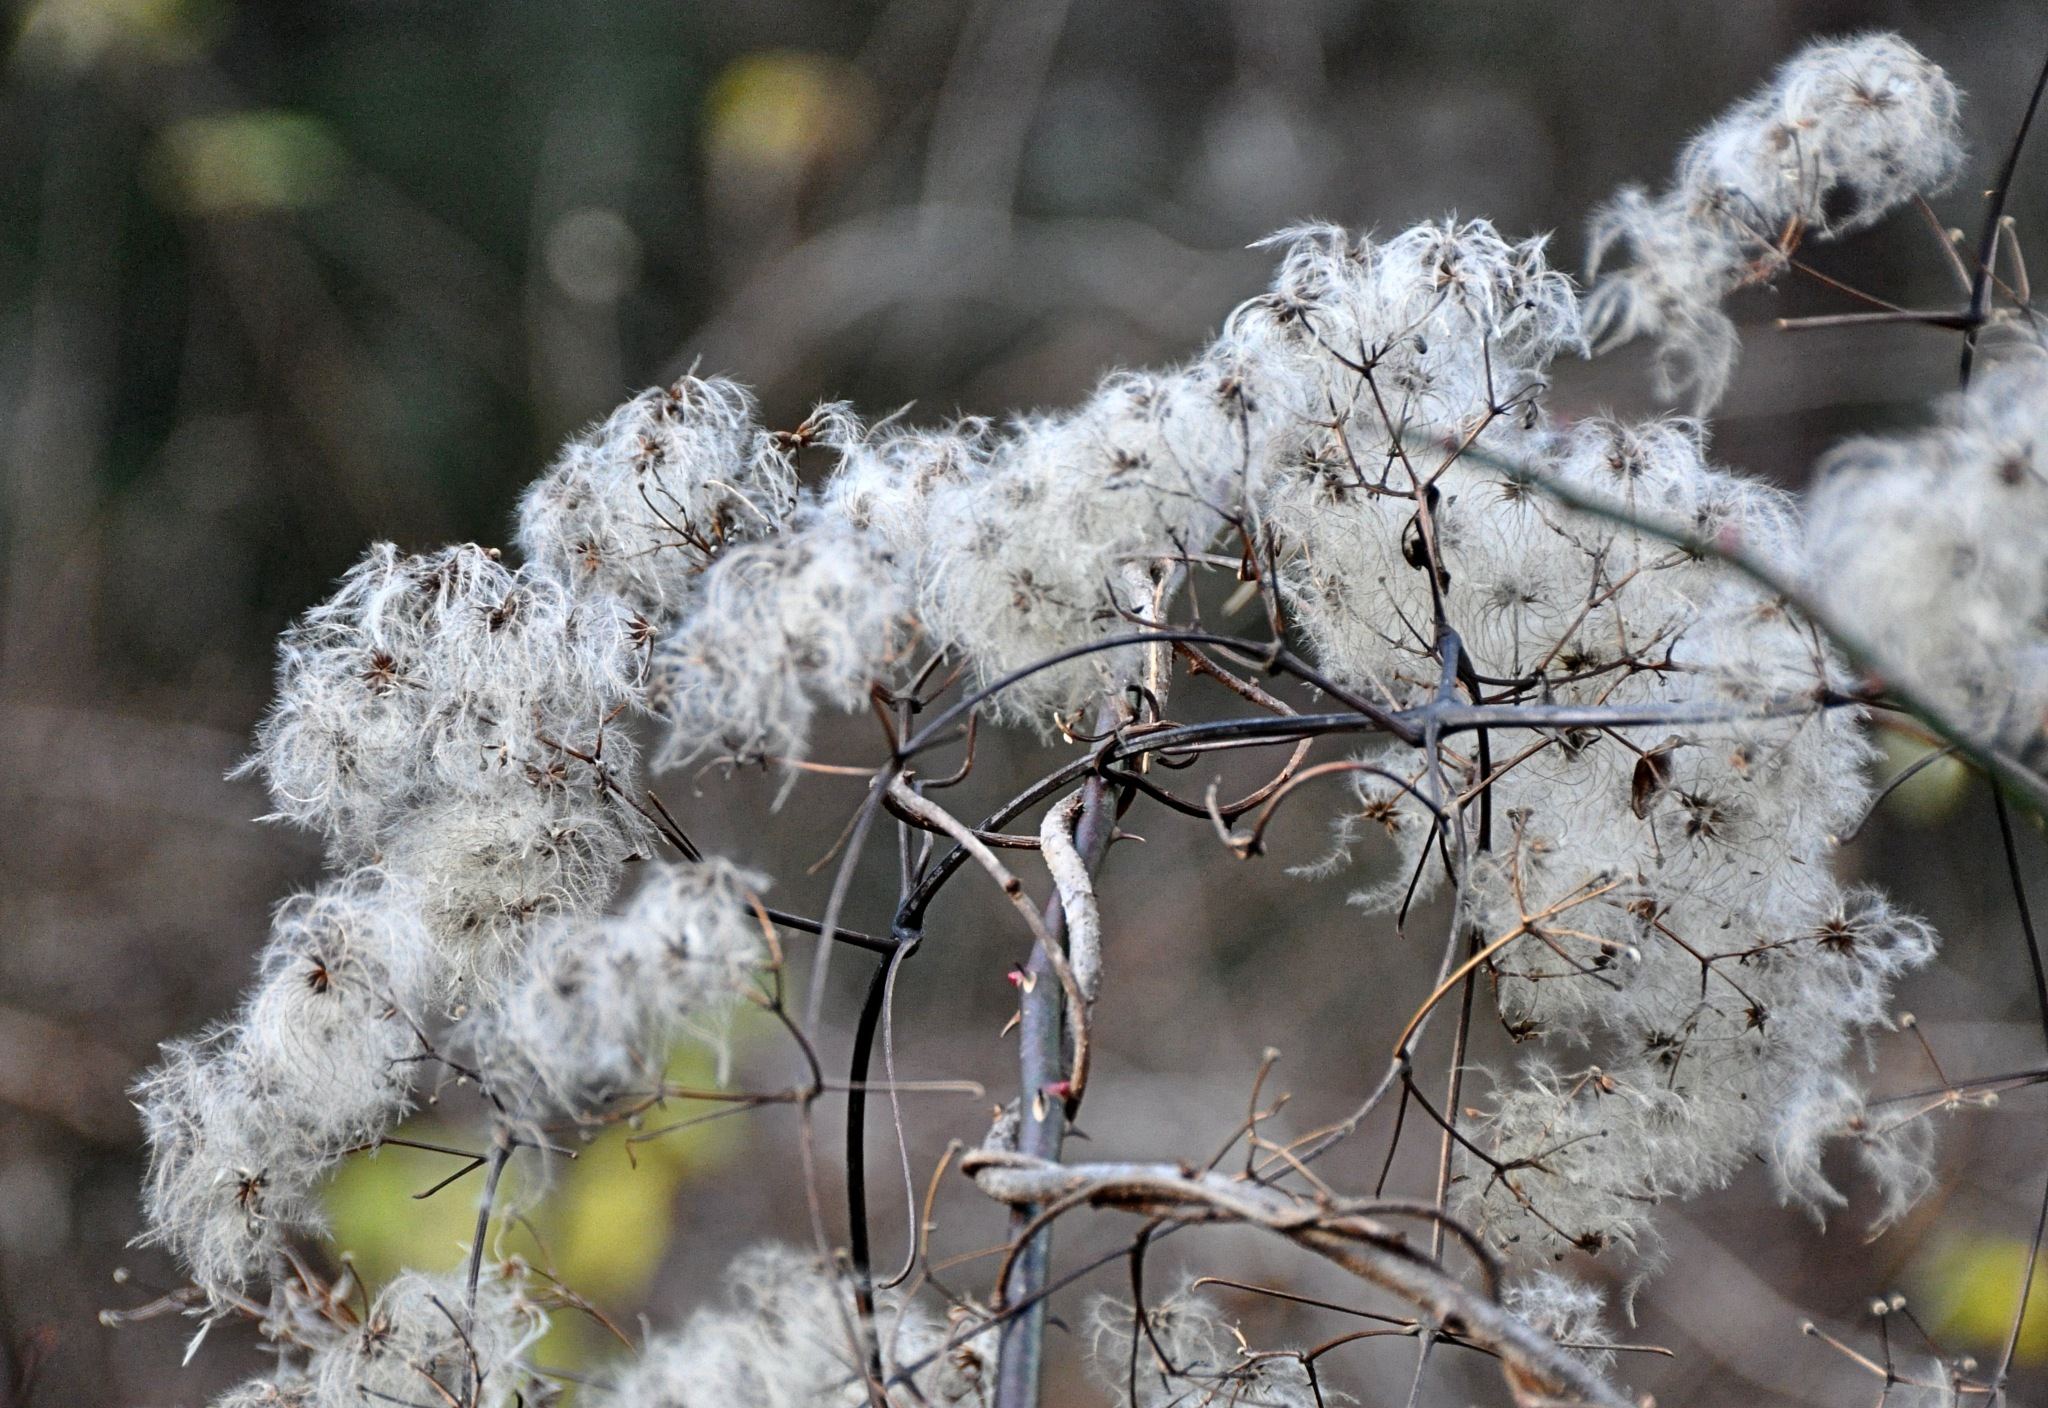 Fuzzy November by Joeski